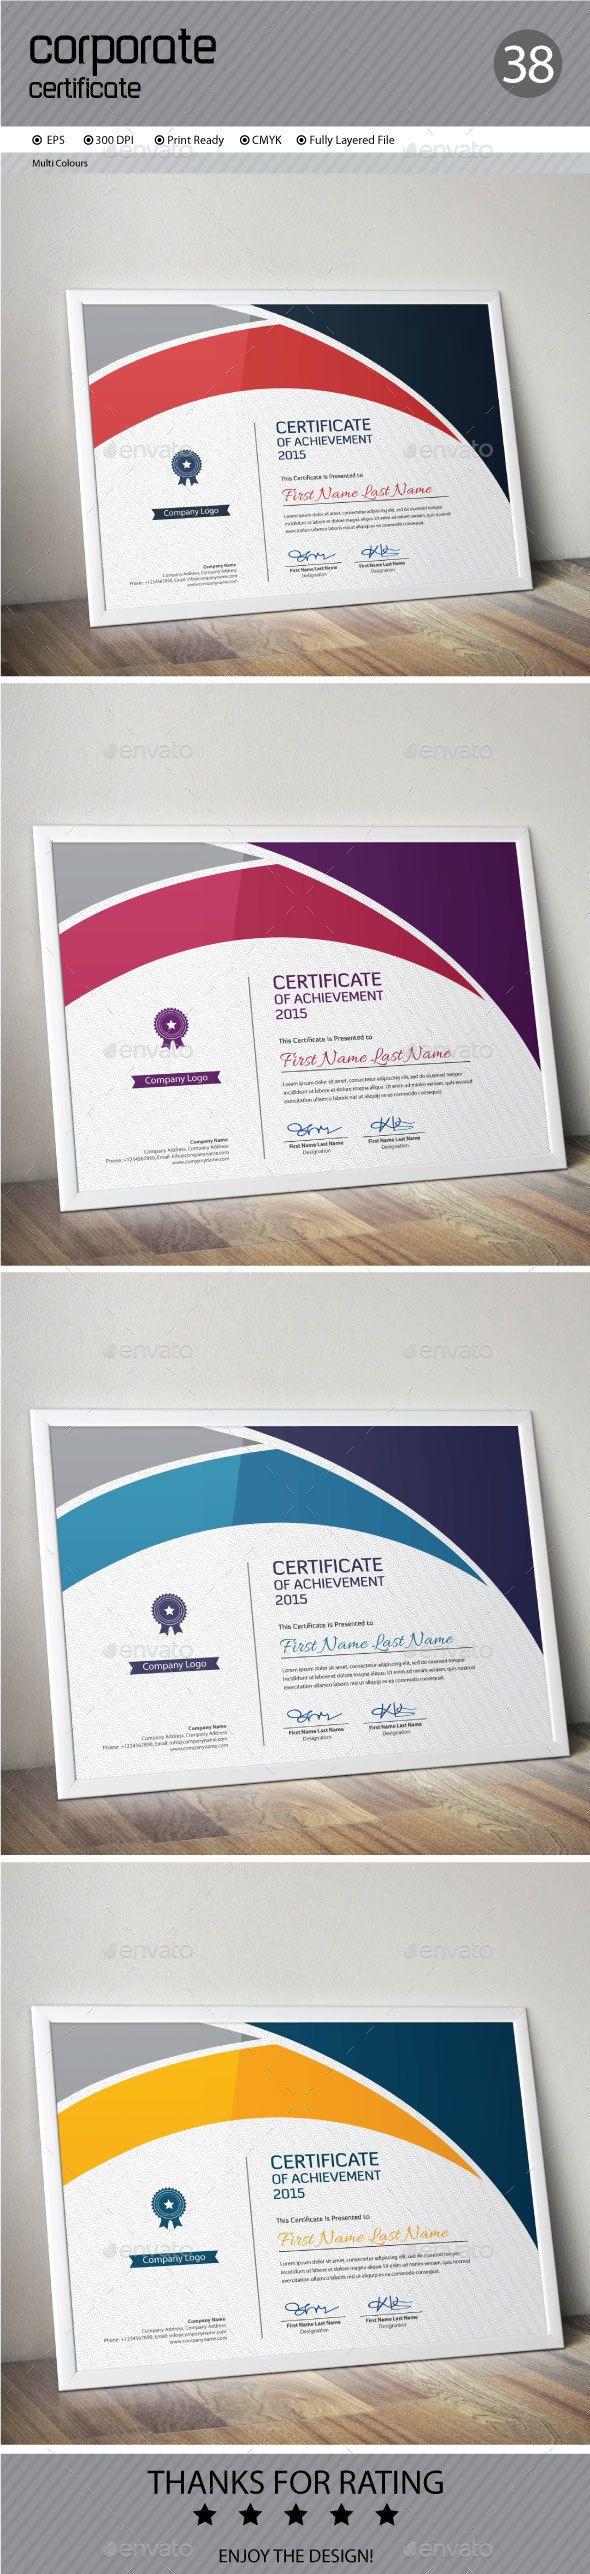 Certificate Template Vector EPS. Download here: http://graphicriver.net/item/certificate/13653275?ref=ksioks